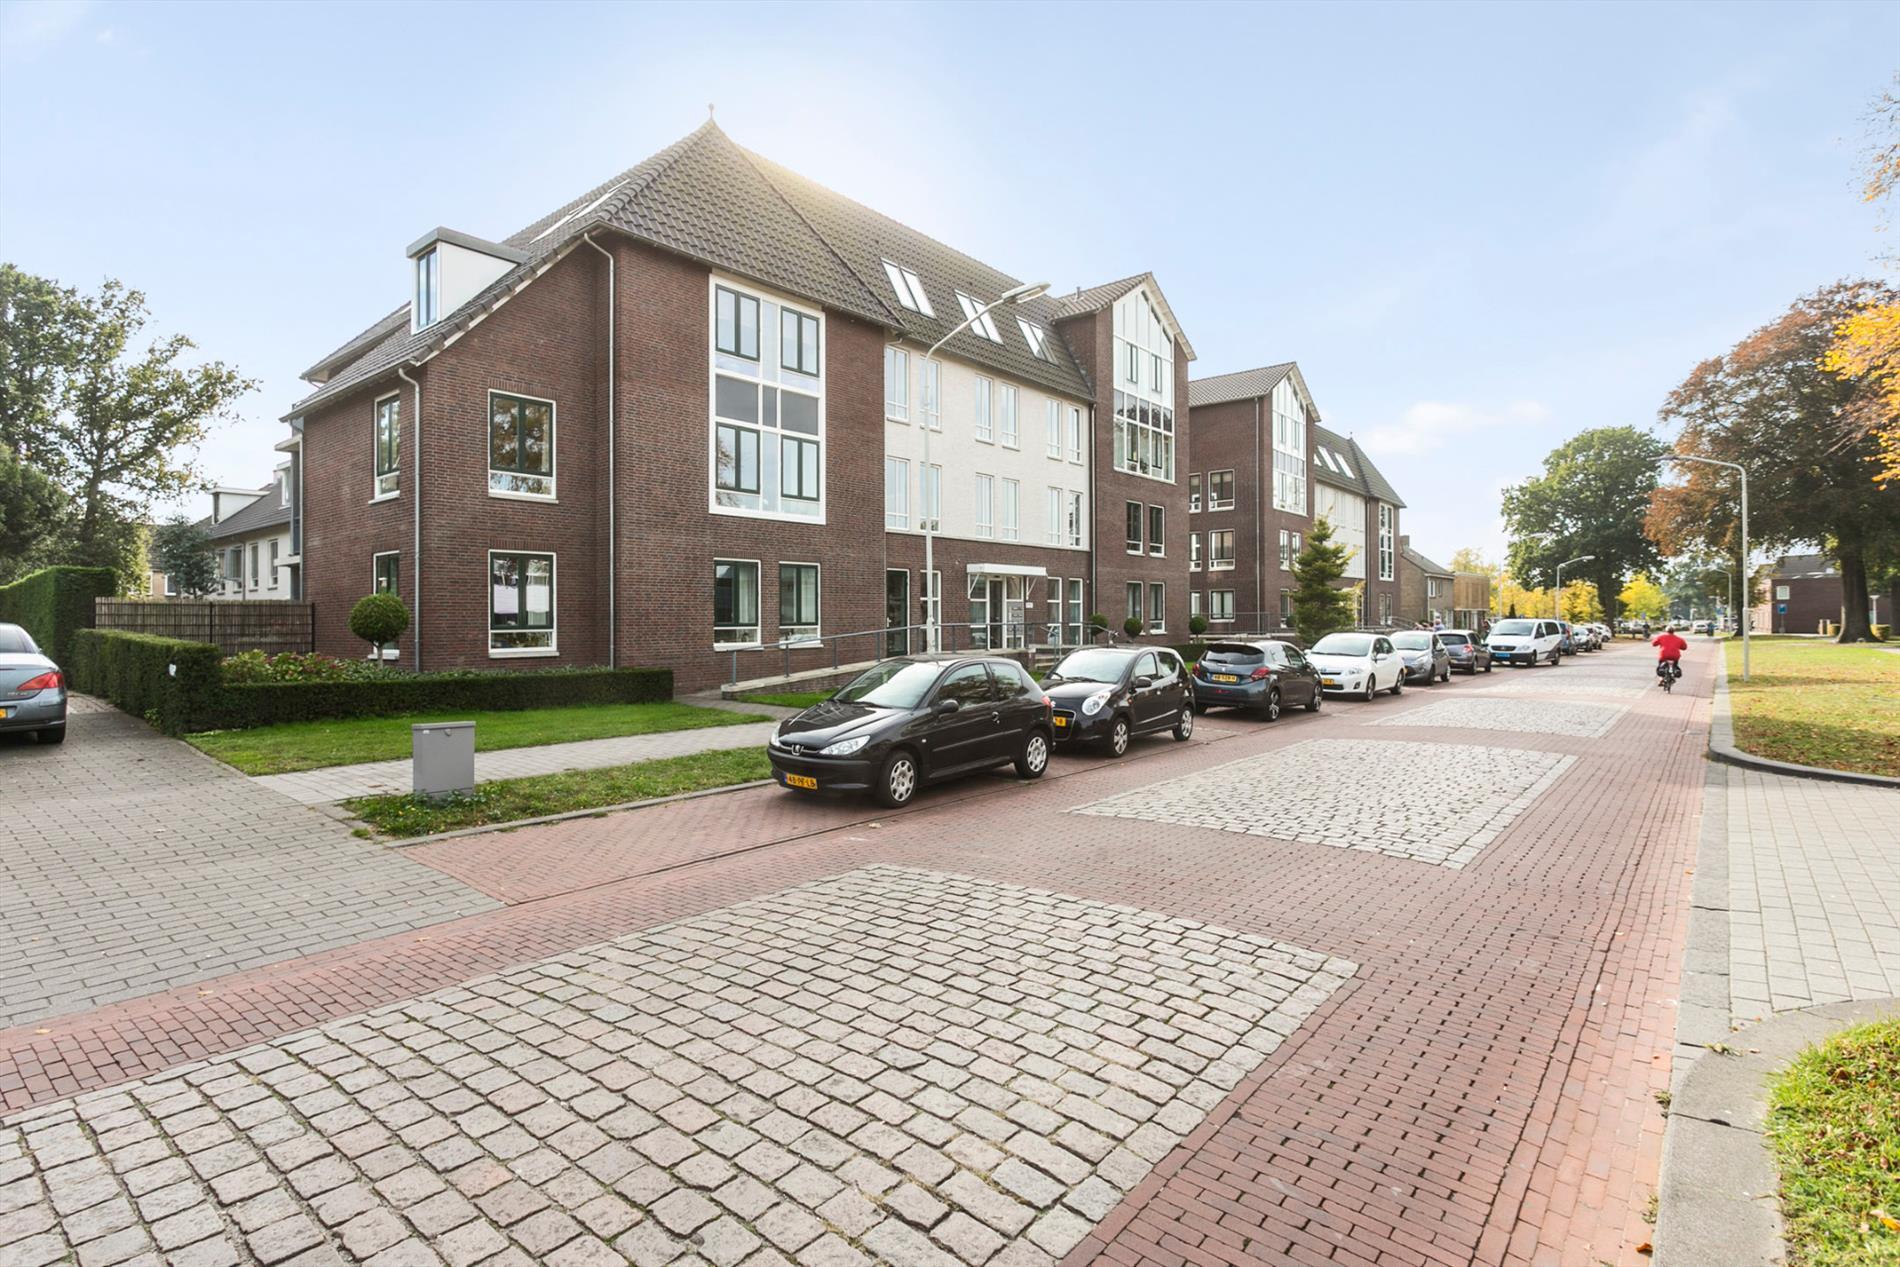 Meulenblock 20, 4631 ZZ Hoogerheide - 05862214_3.jpg